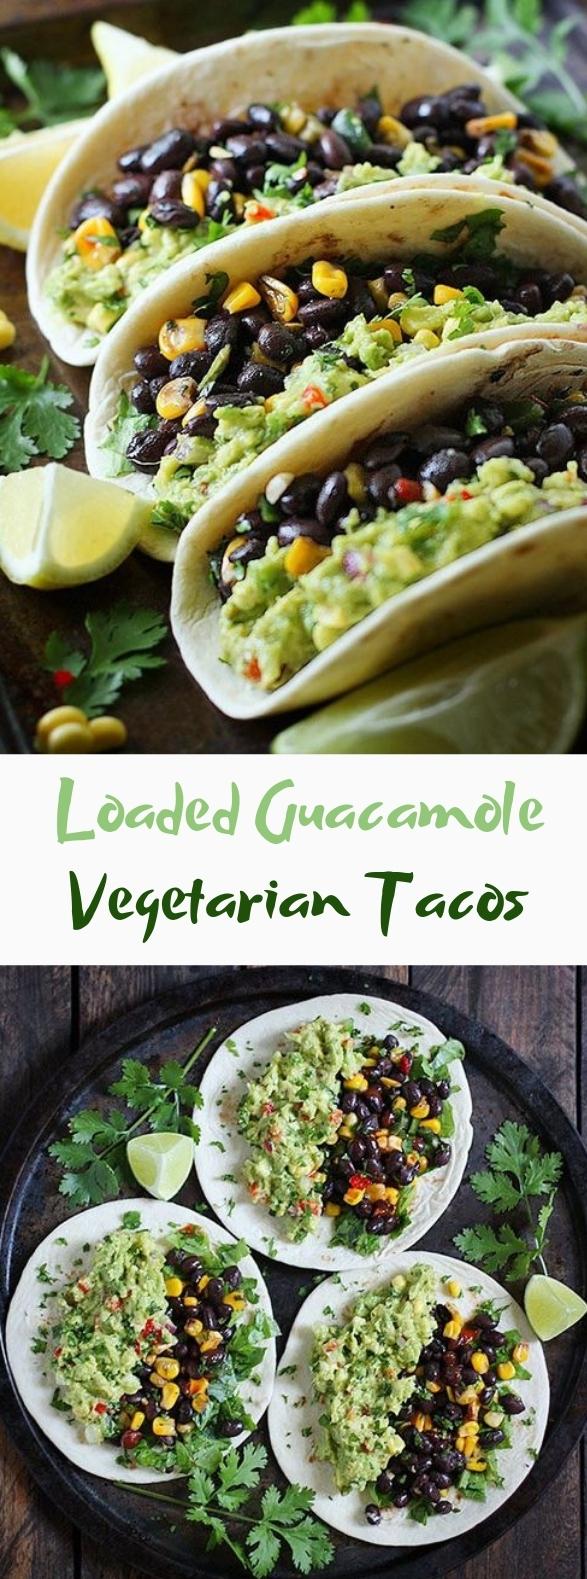 Loaded Guacamole Vegetarian Tacos #tacos #vegetarian